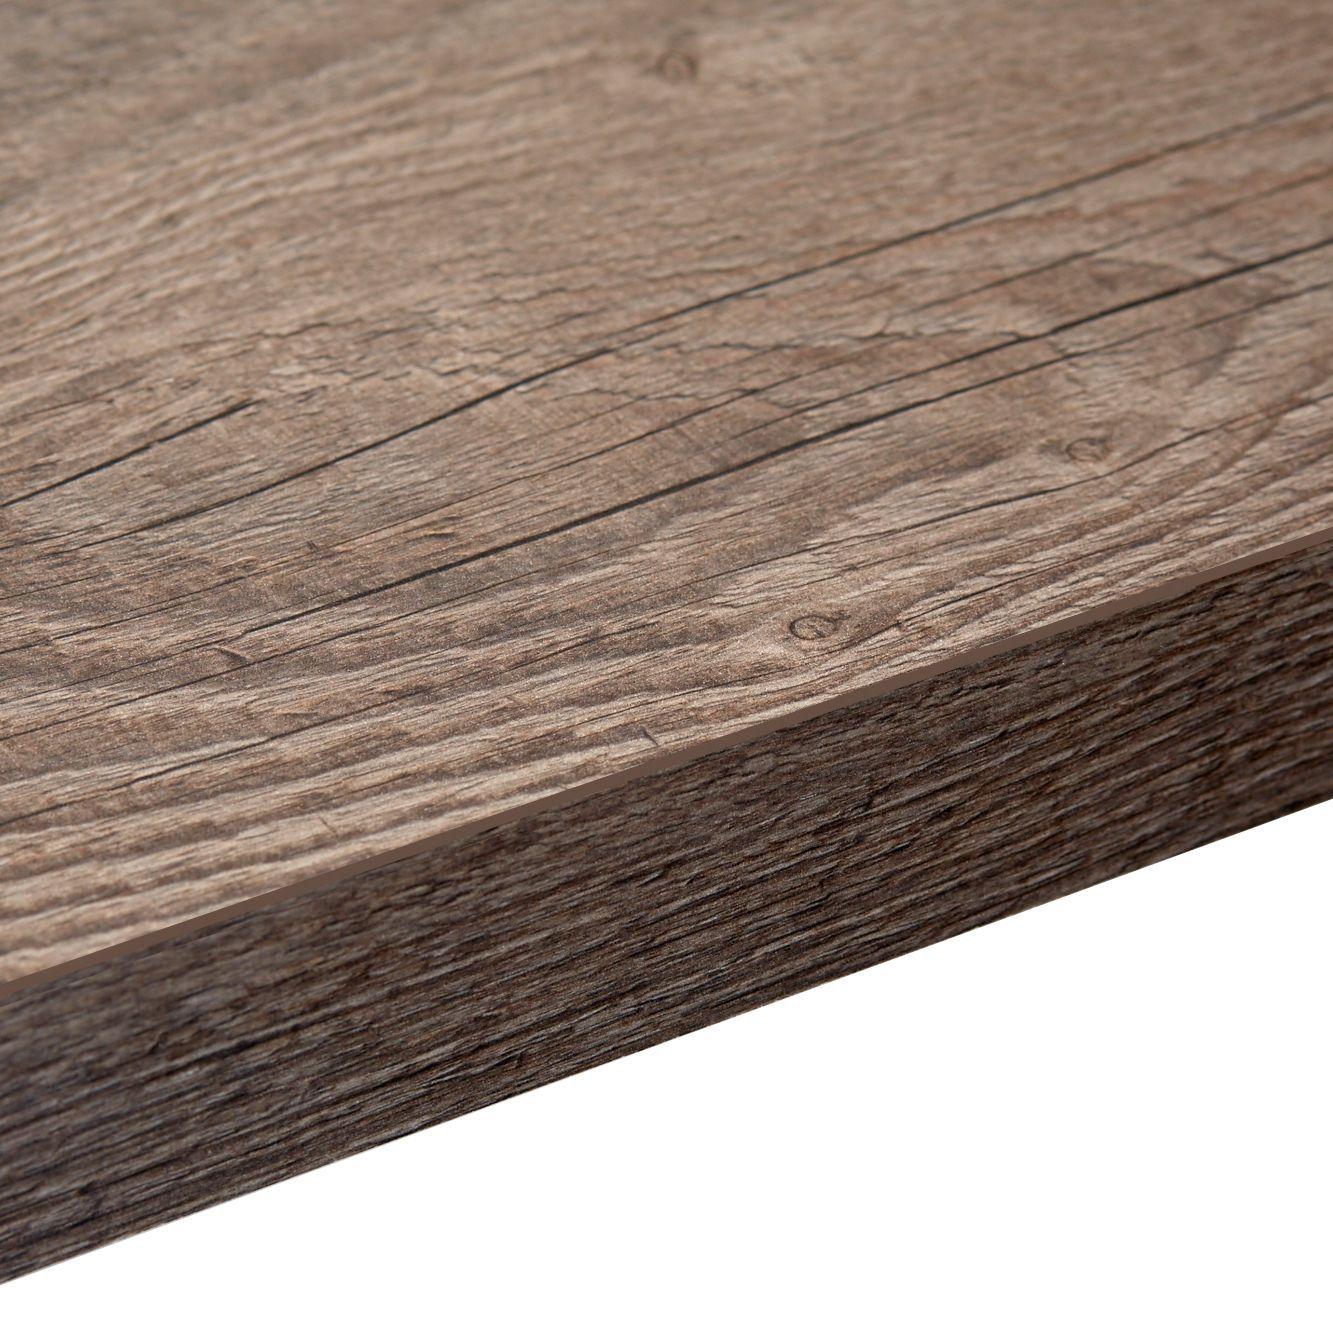 kitchen laminate worktops. 38mm B Q Mountain Timber Laminate Wood Effect Square Edge Worktop  L 3600mm D 600mm Departments DIY at